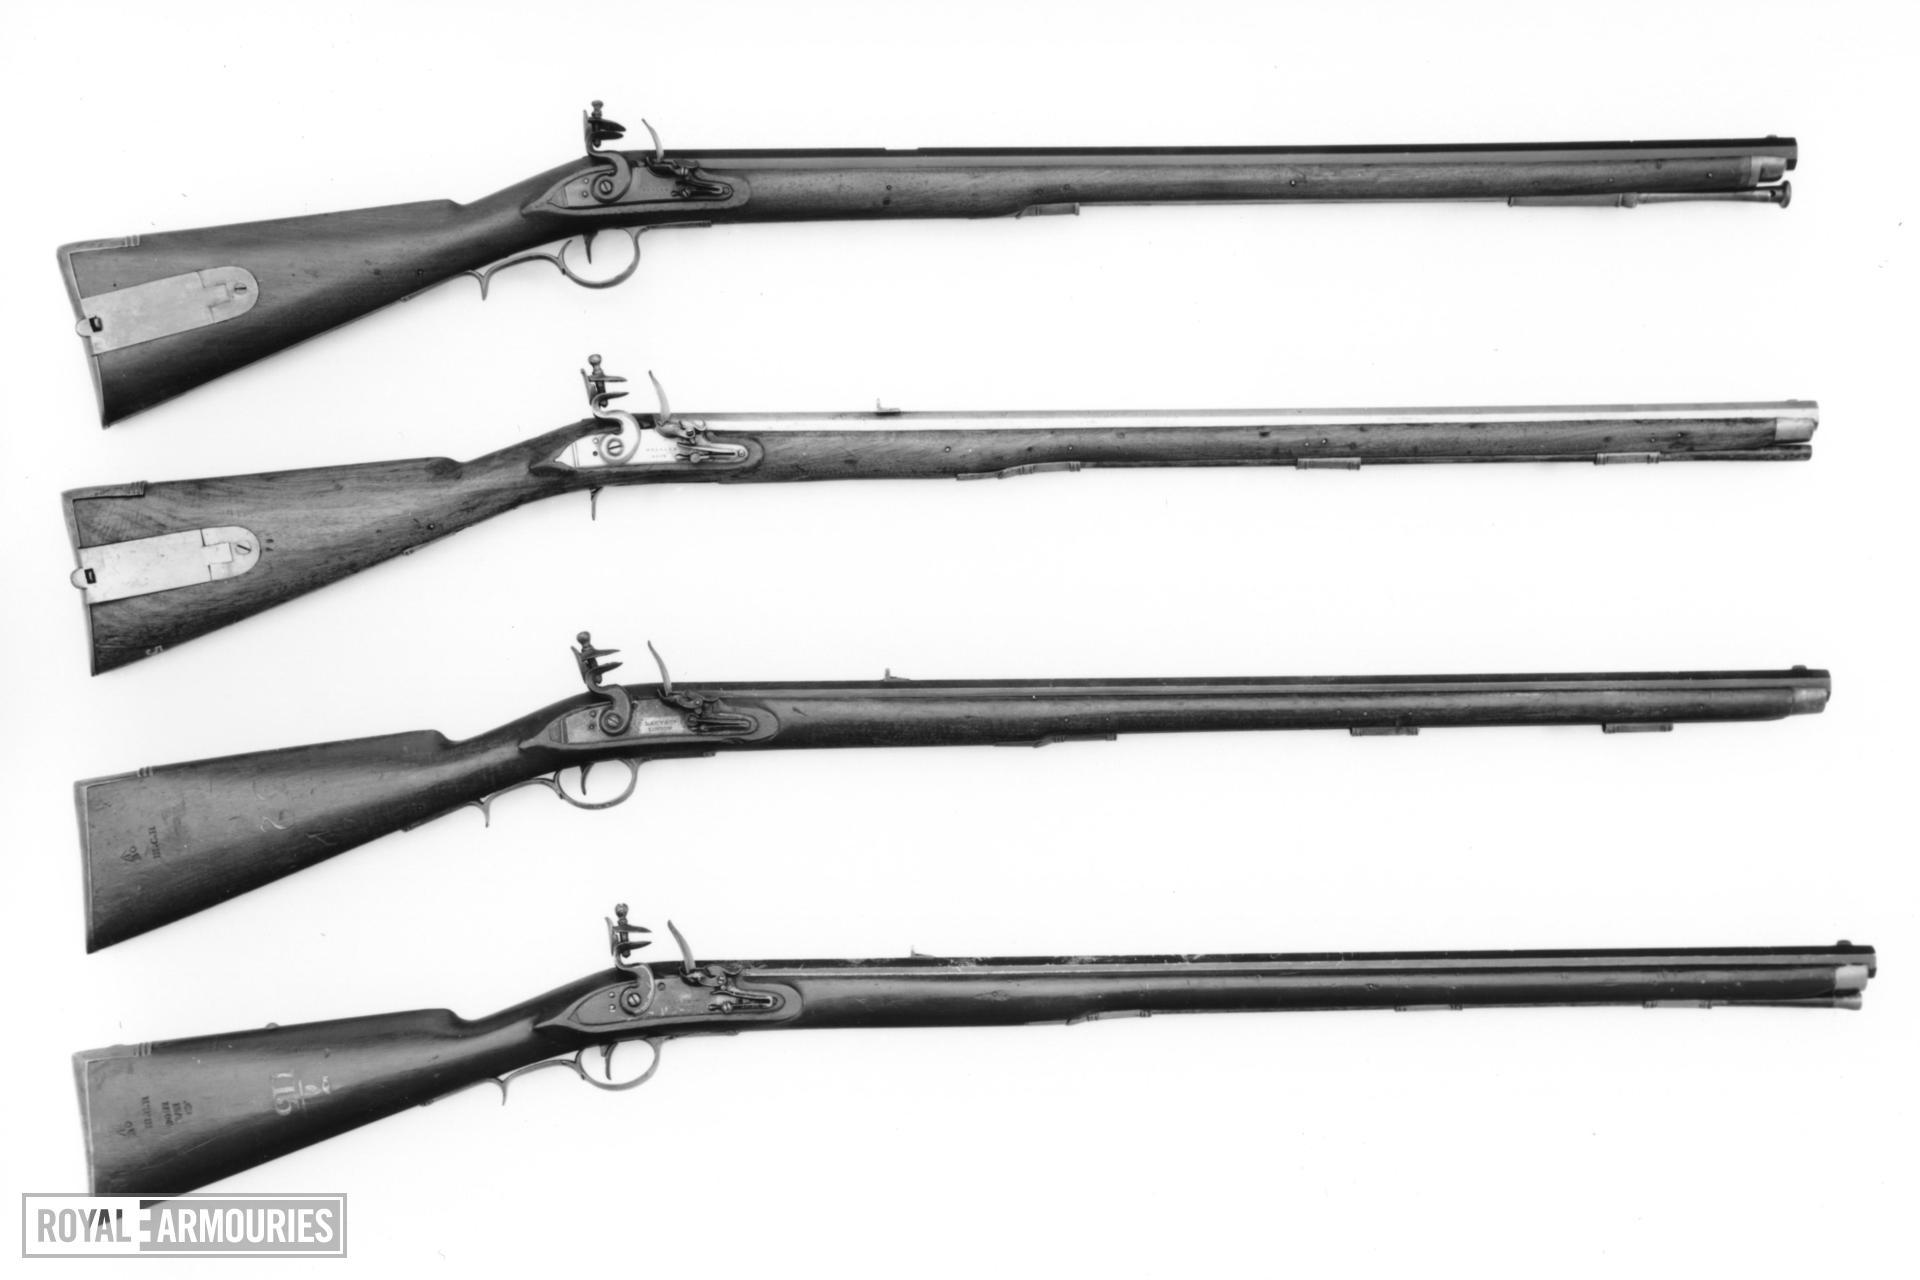 Flintlock muzzle-loading rifle - By Lacy & Co